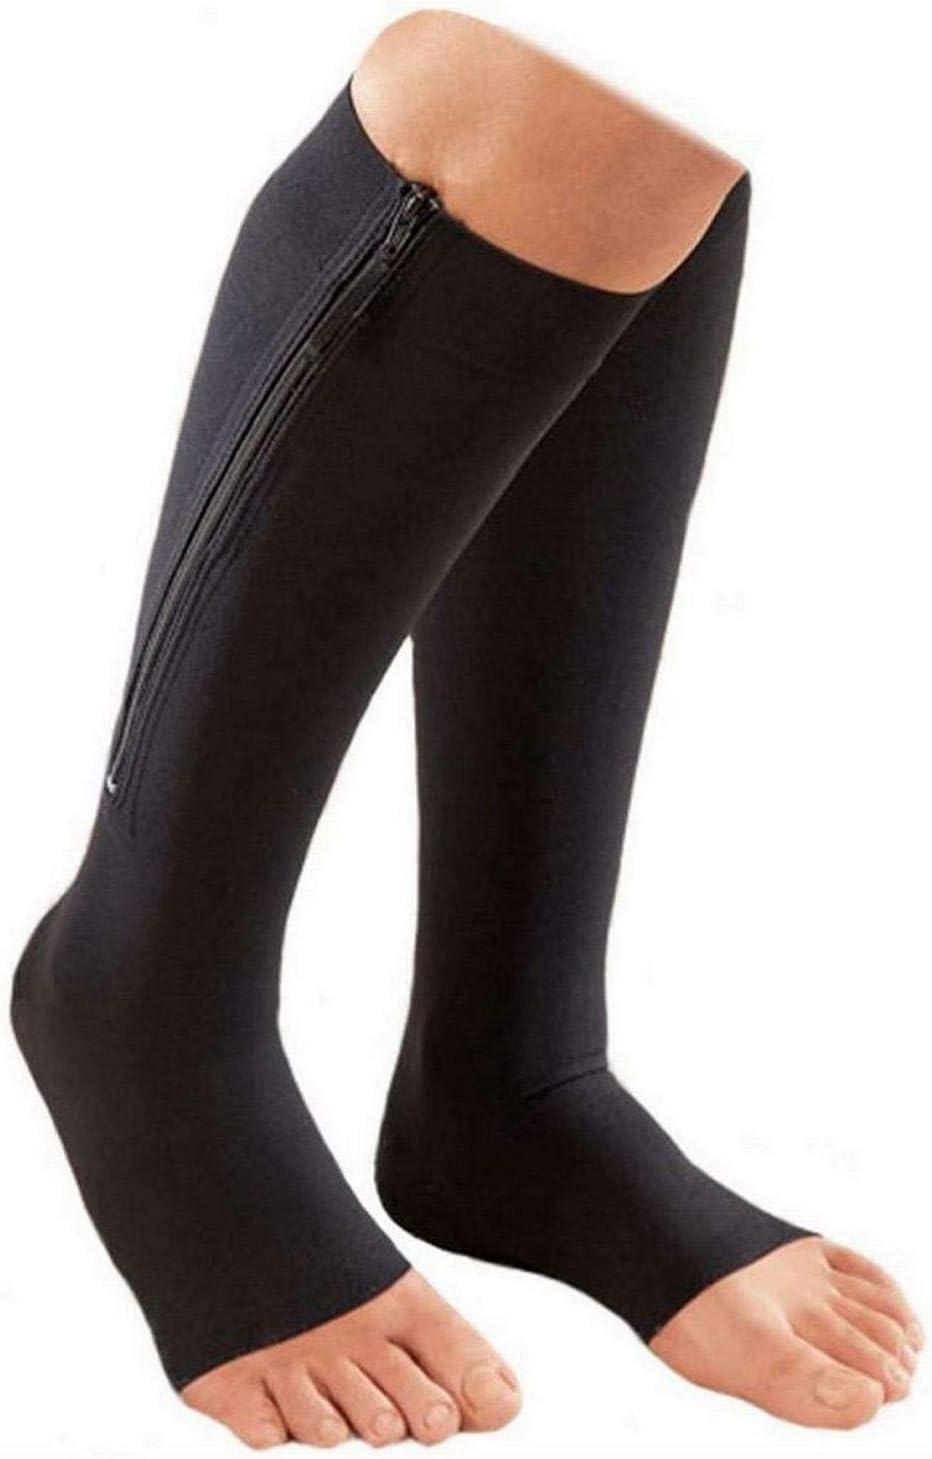 Beige, S//M Starmace 30-40 mmHg Zipper Compression Medical Leg Calf Swelling Open Toe Socks